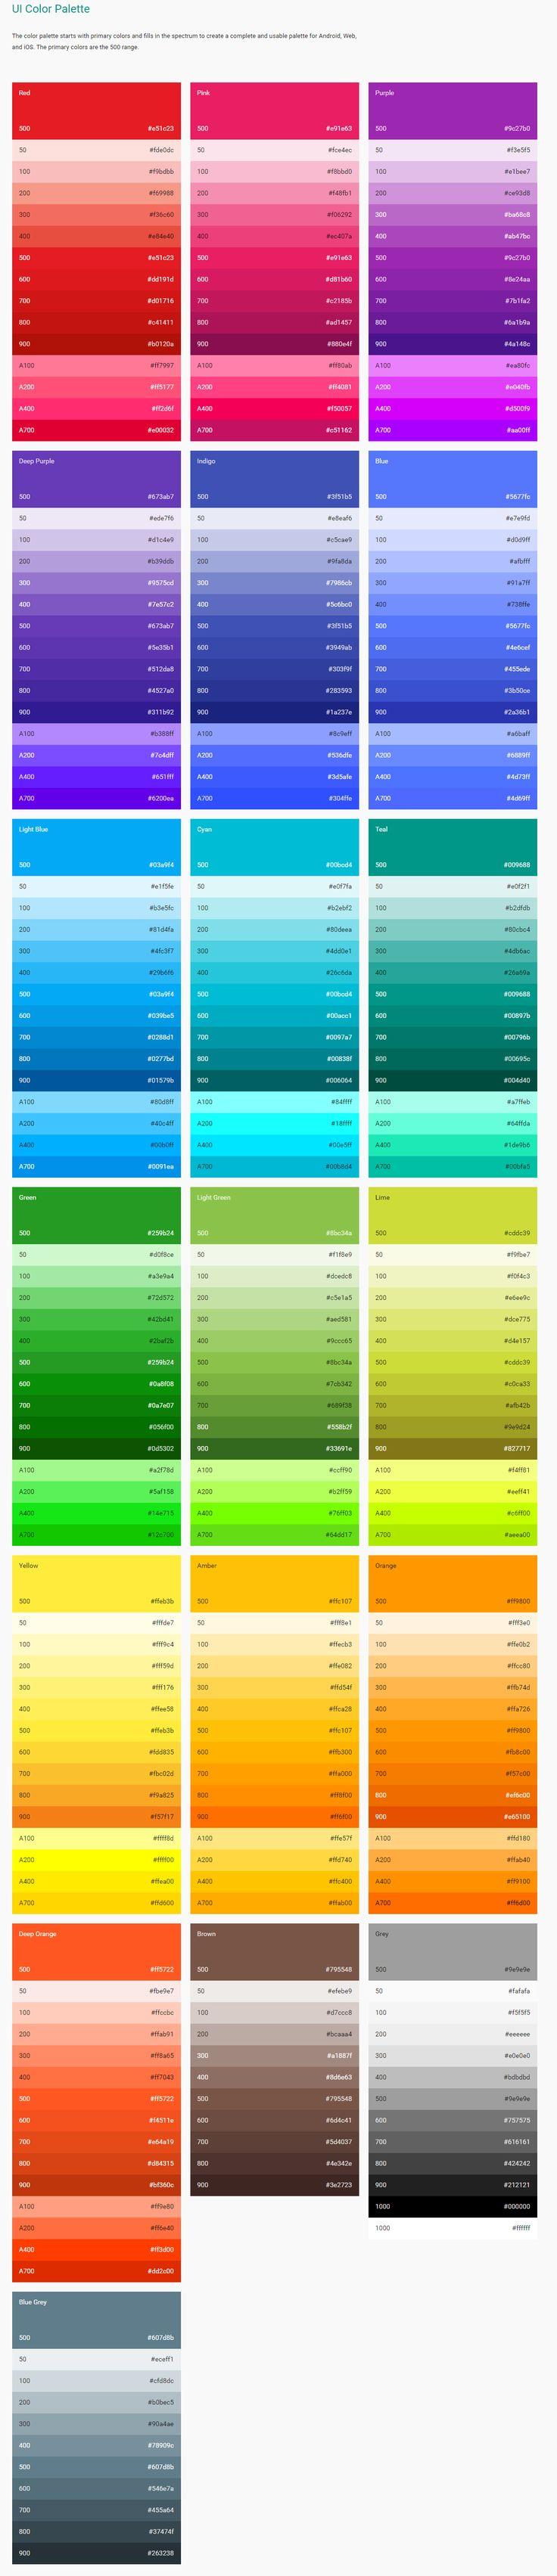 Google's 2014 Color Palette for Material Design  #google #MaterialDesign #design2014 #trends #googleUI